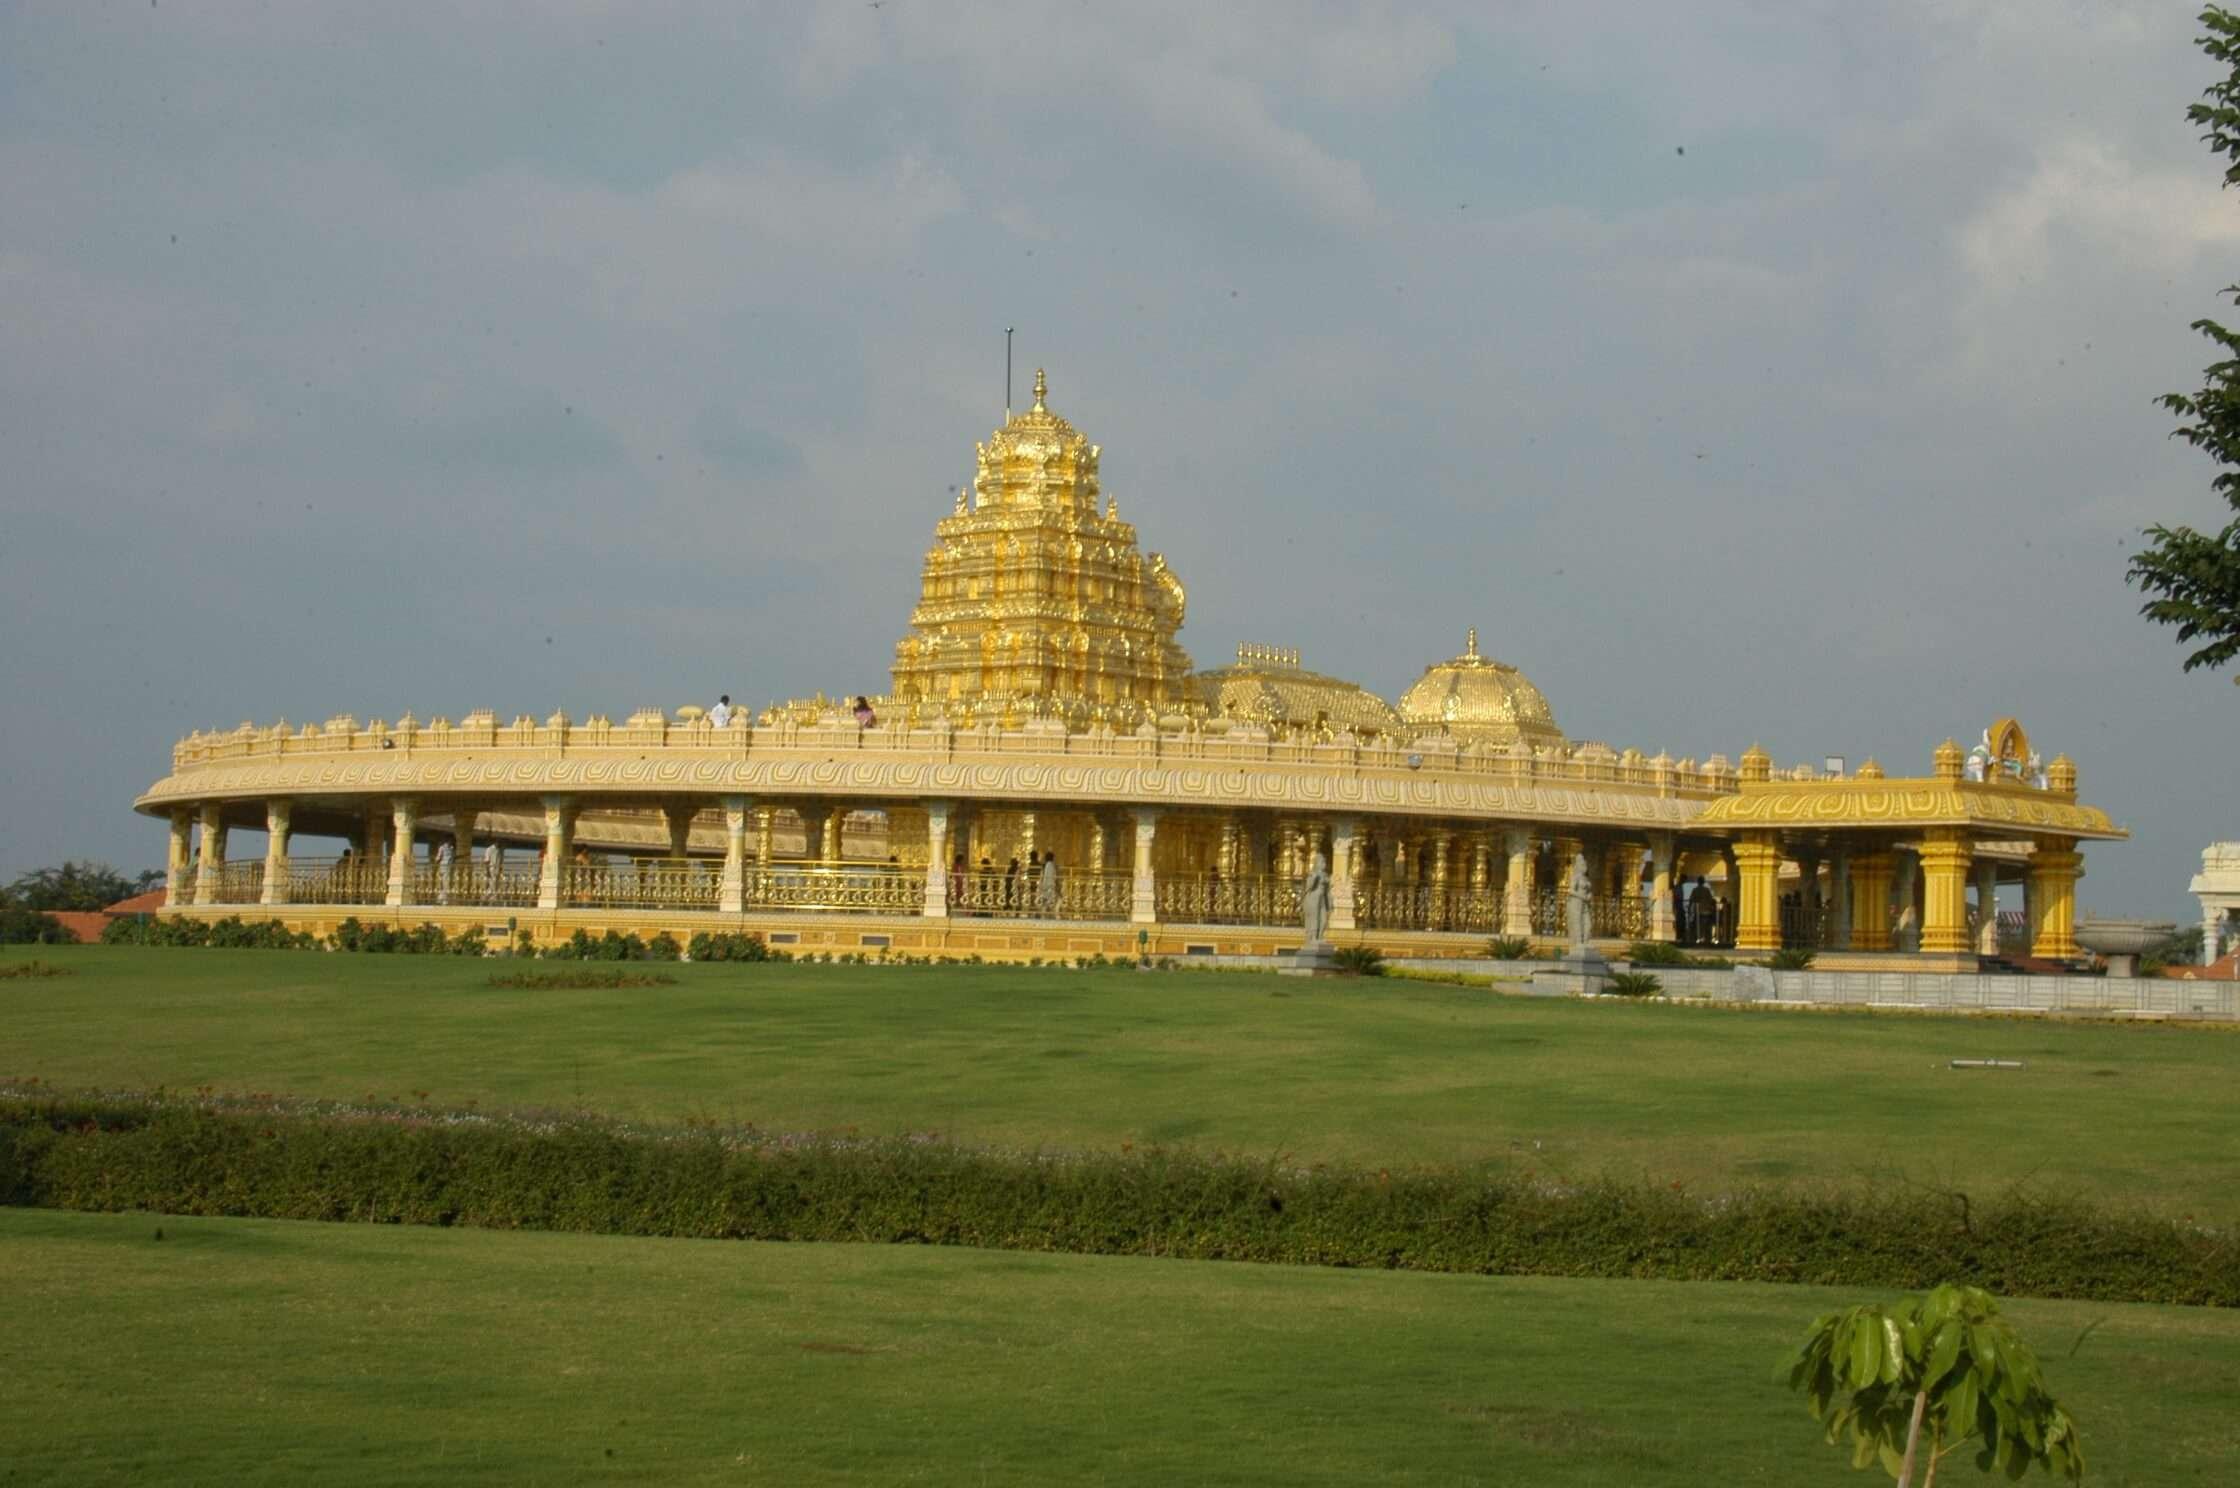 a golden temple